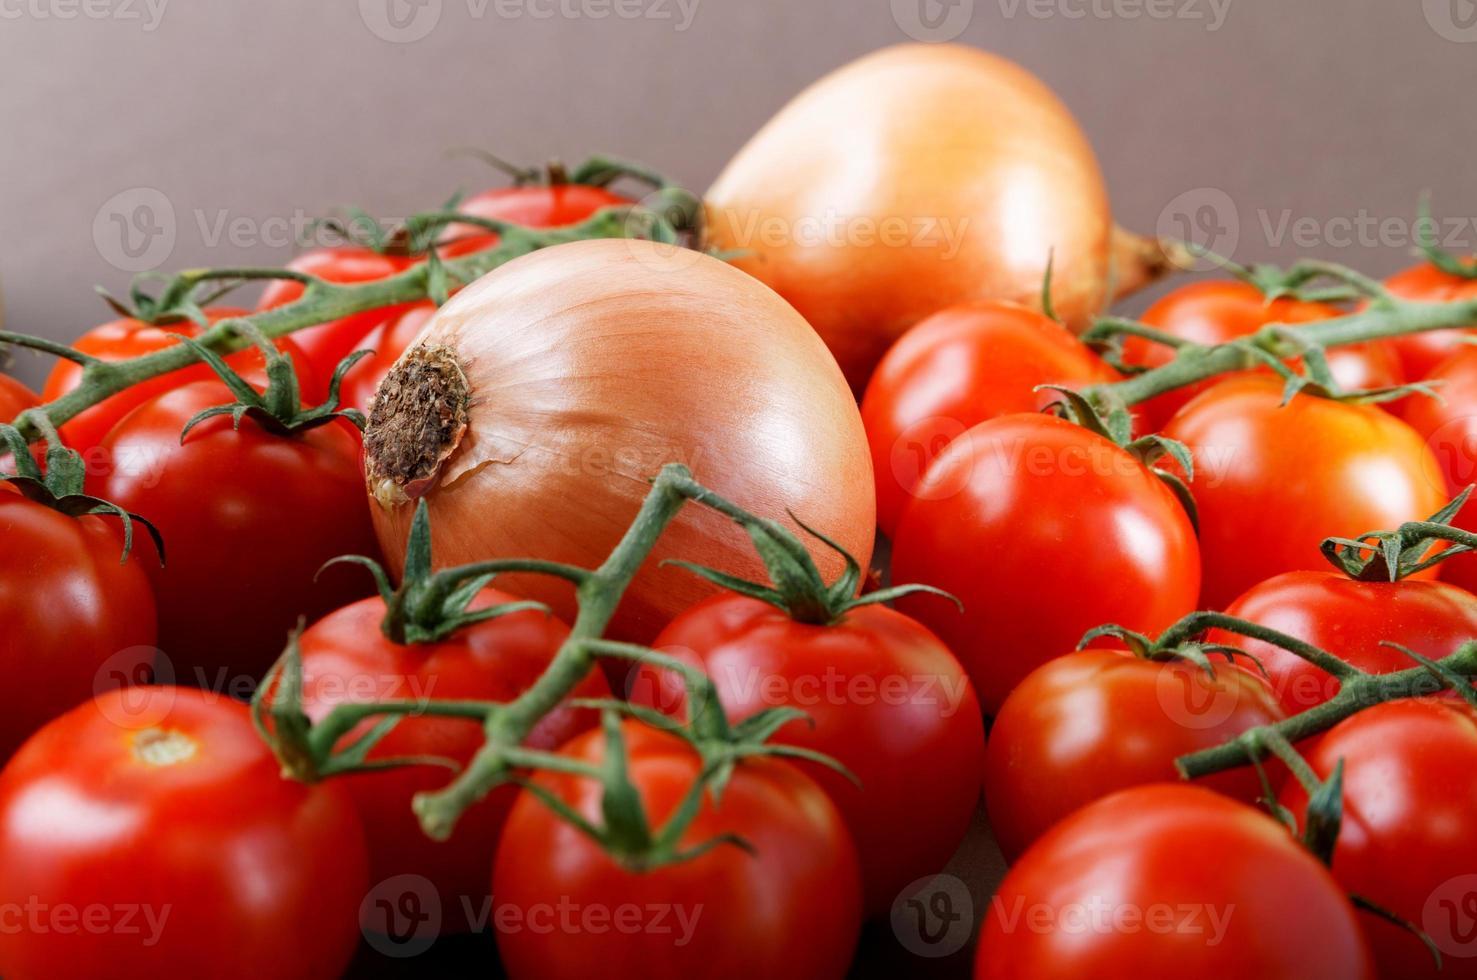 natureza-morta com cebola e tomate cereja foto